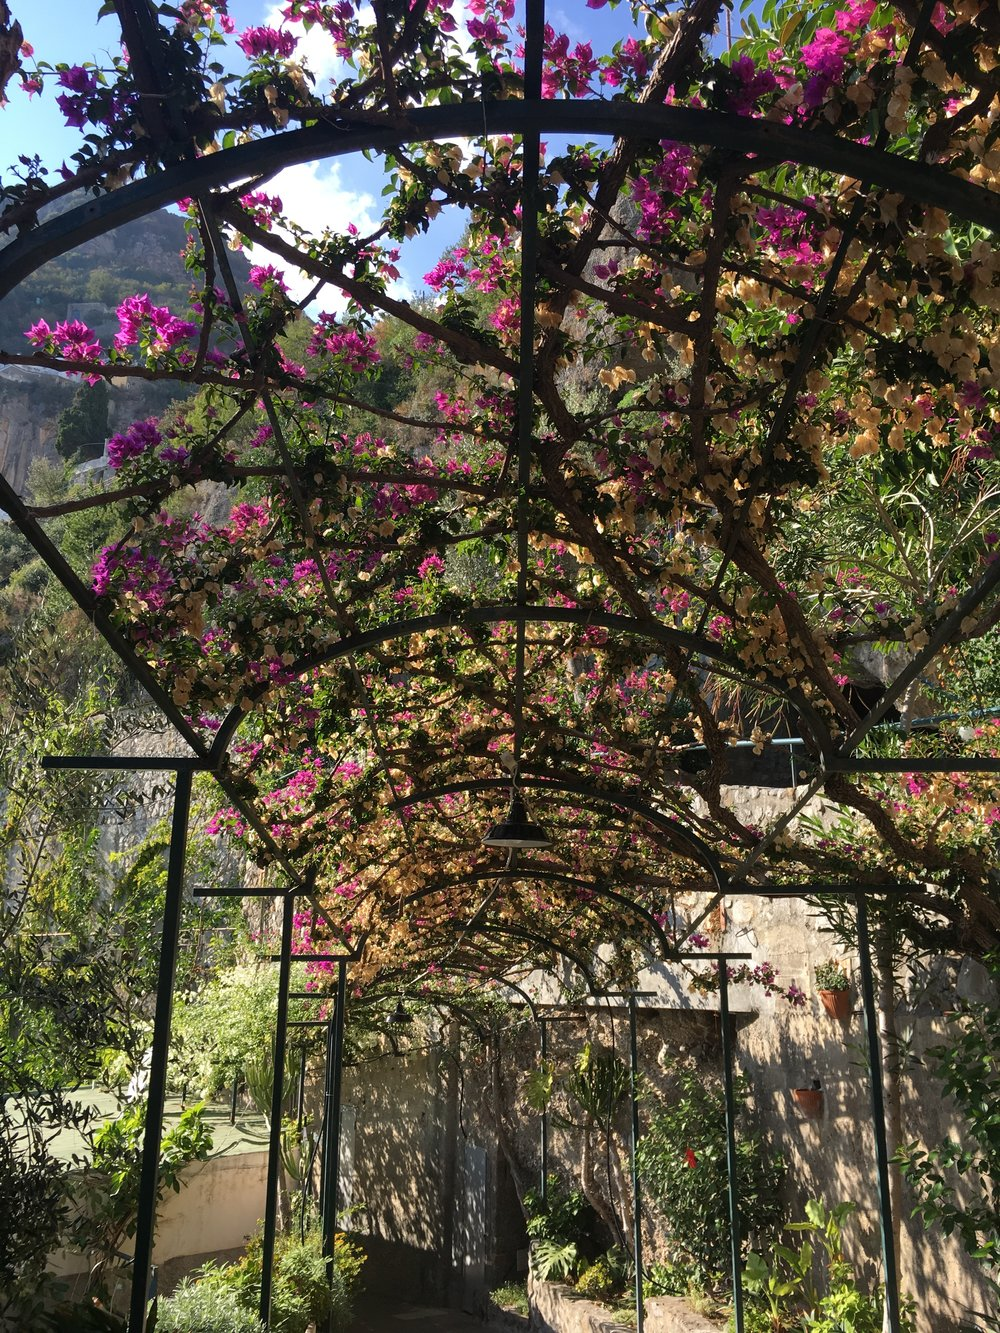 Day 4 - Positano 🍋 — Rosé & Roam